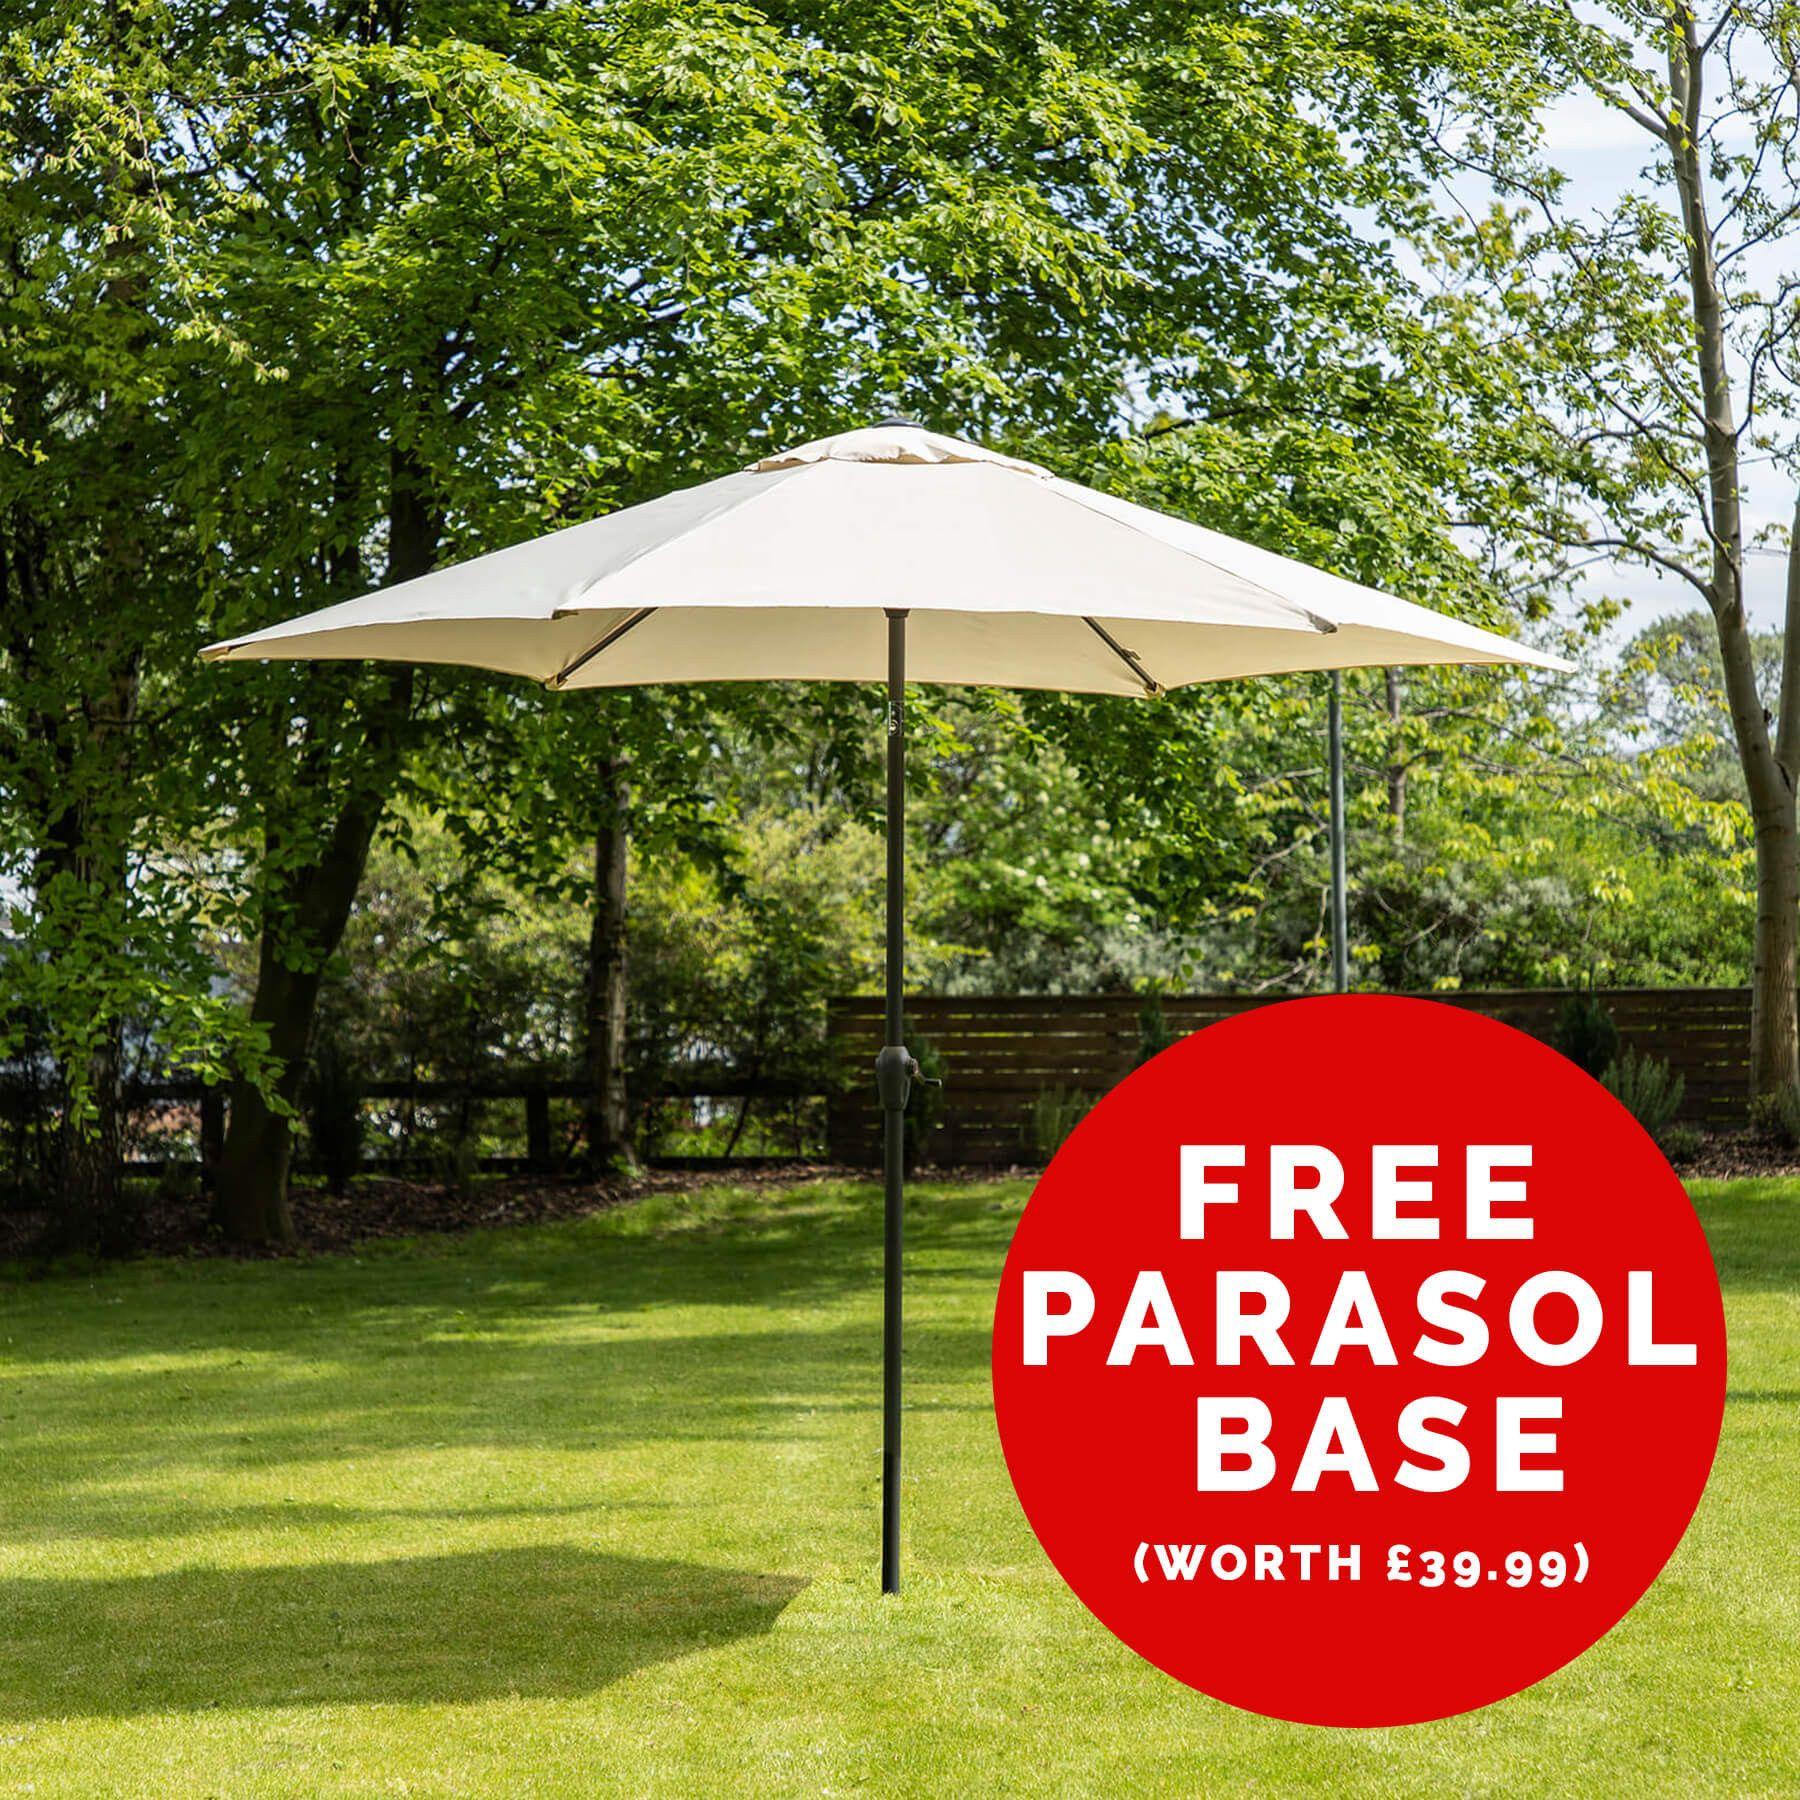 3m Aluminium Wind Up Garden Parasol + FREE 16kg Weave Effect Parasol Base at Alfresia £44.99